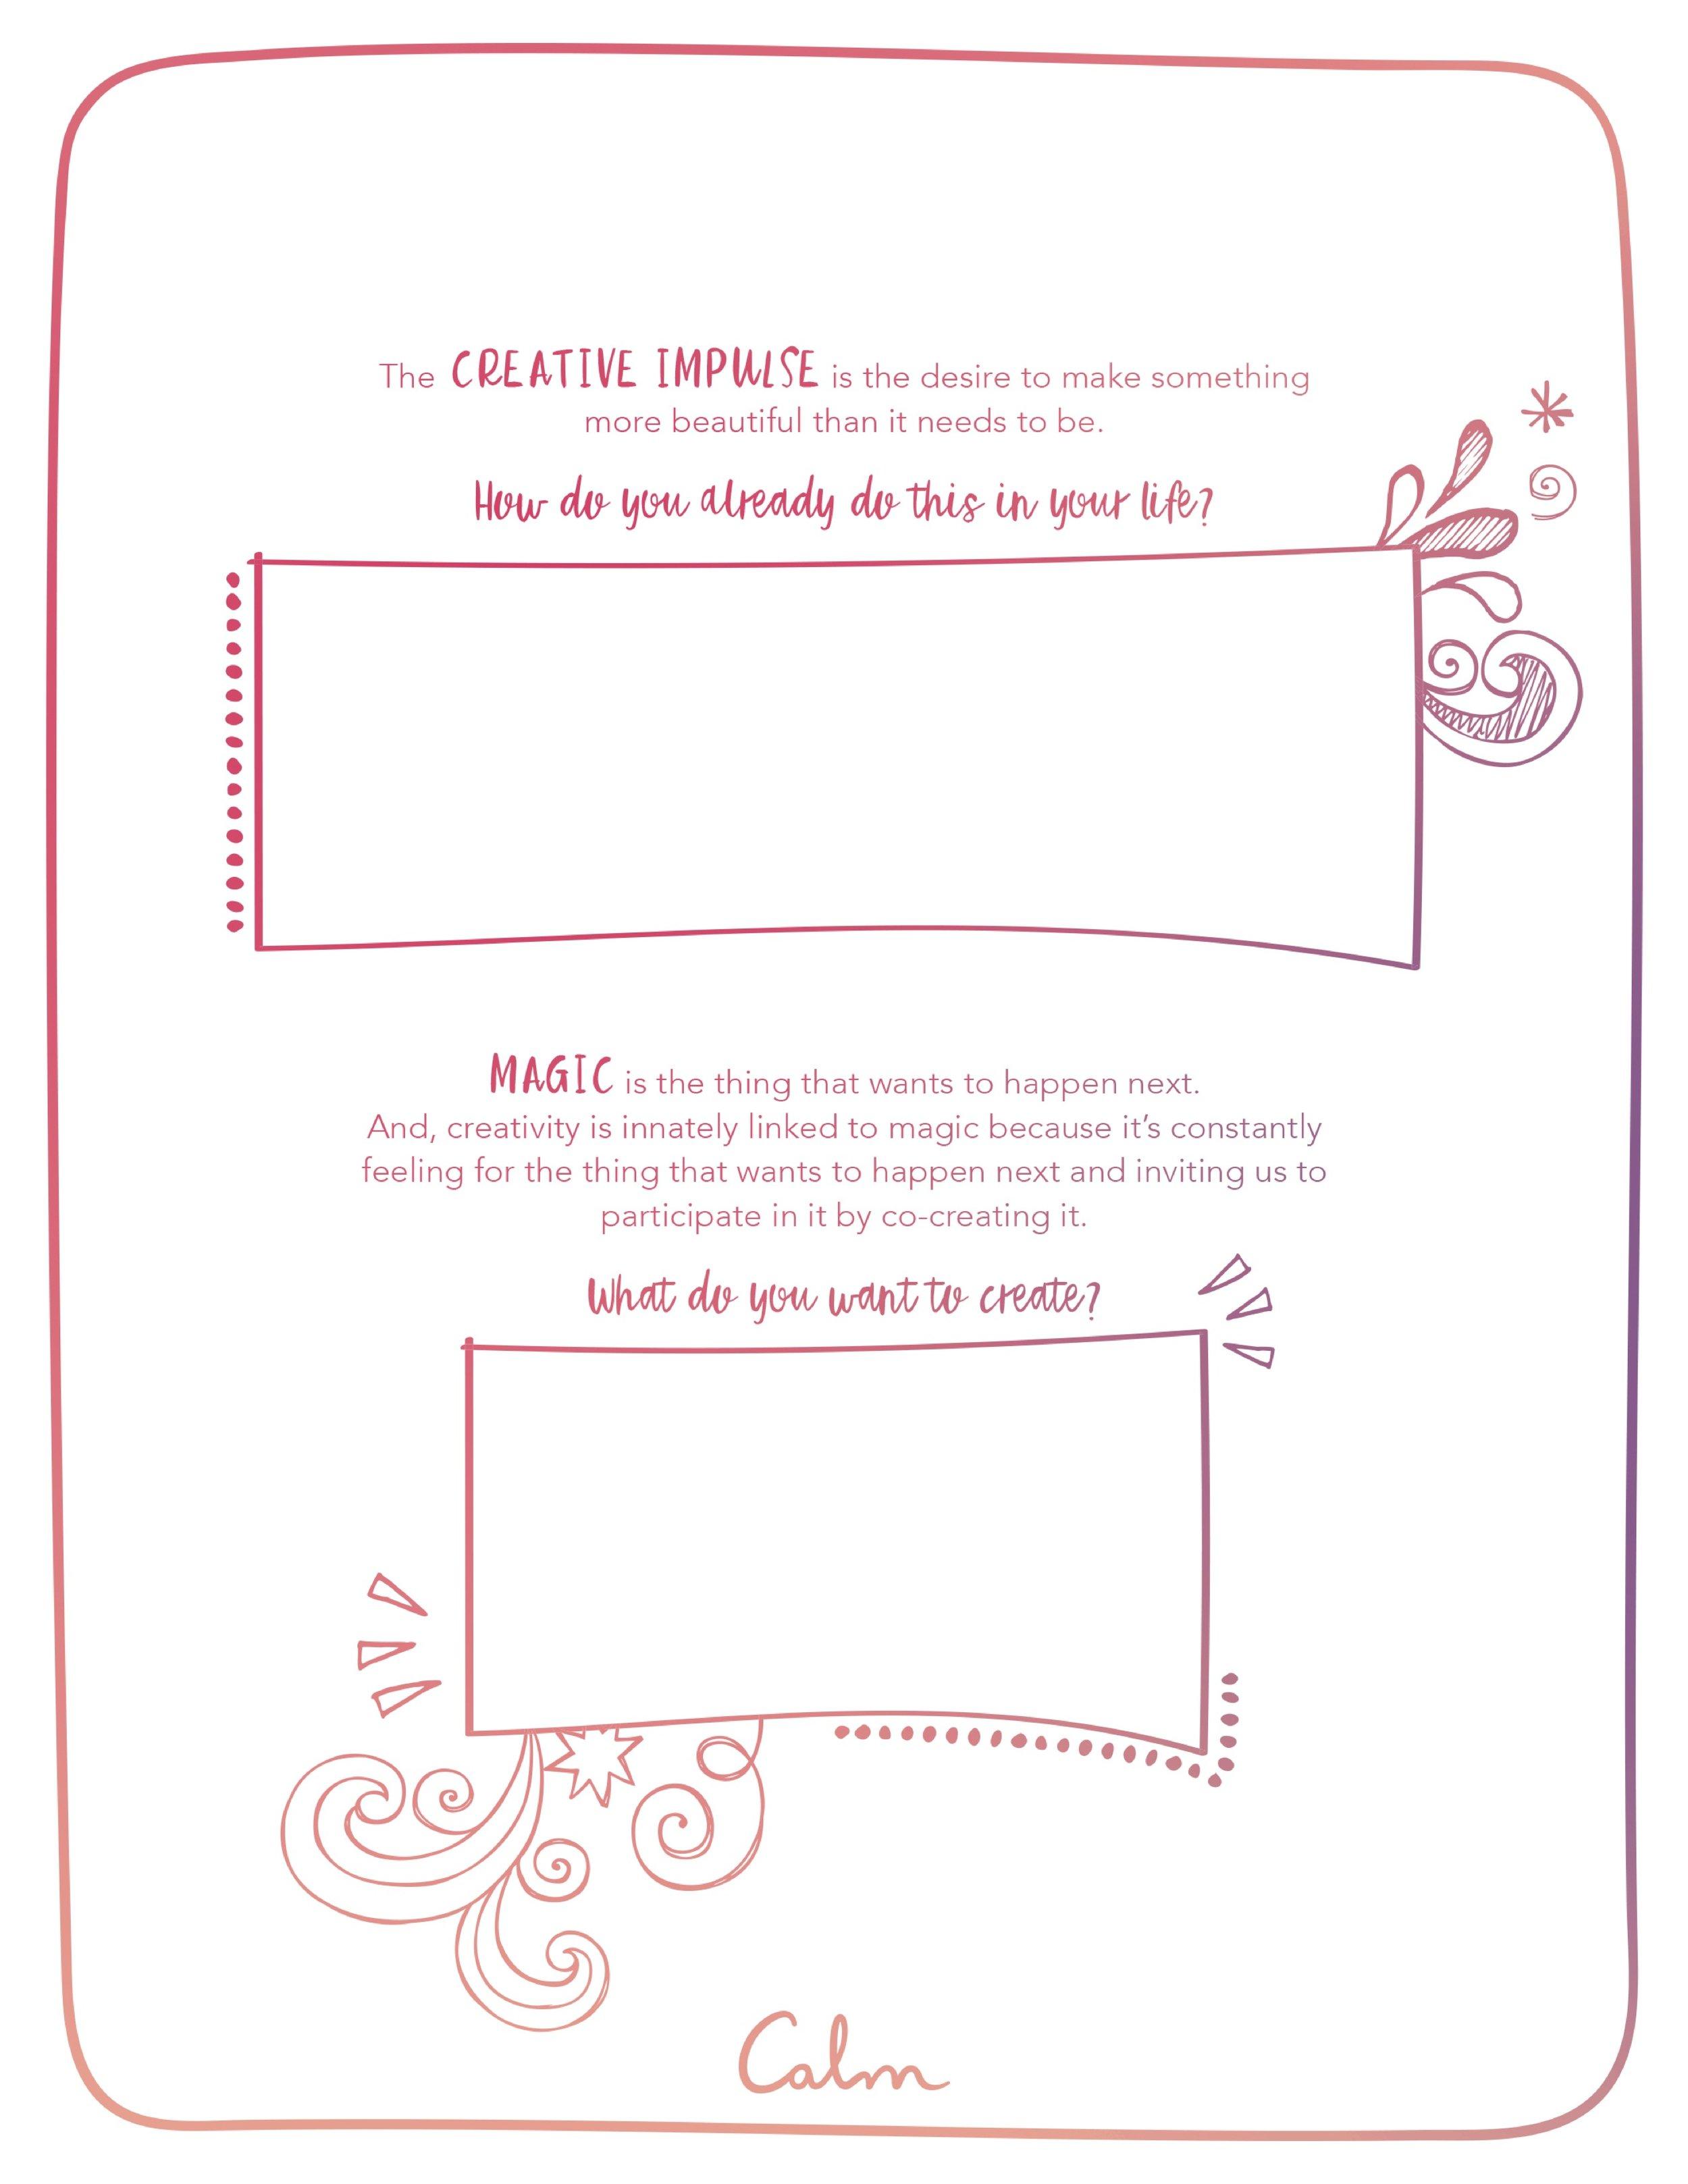 CreativeLivingJournal_Calm 4.jpg